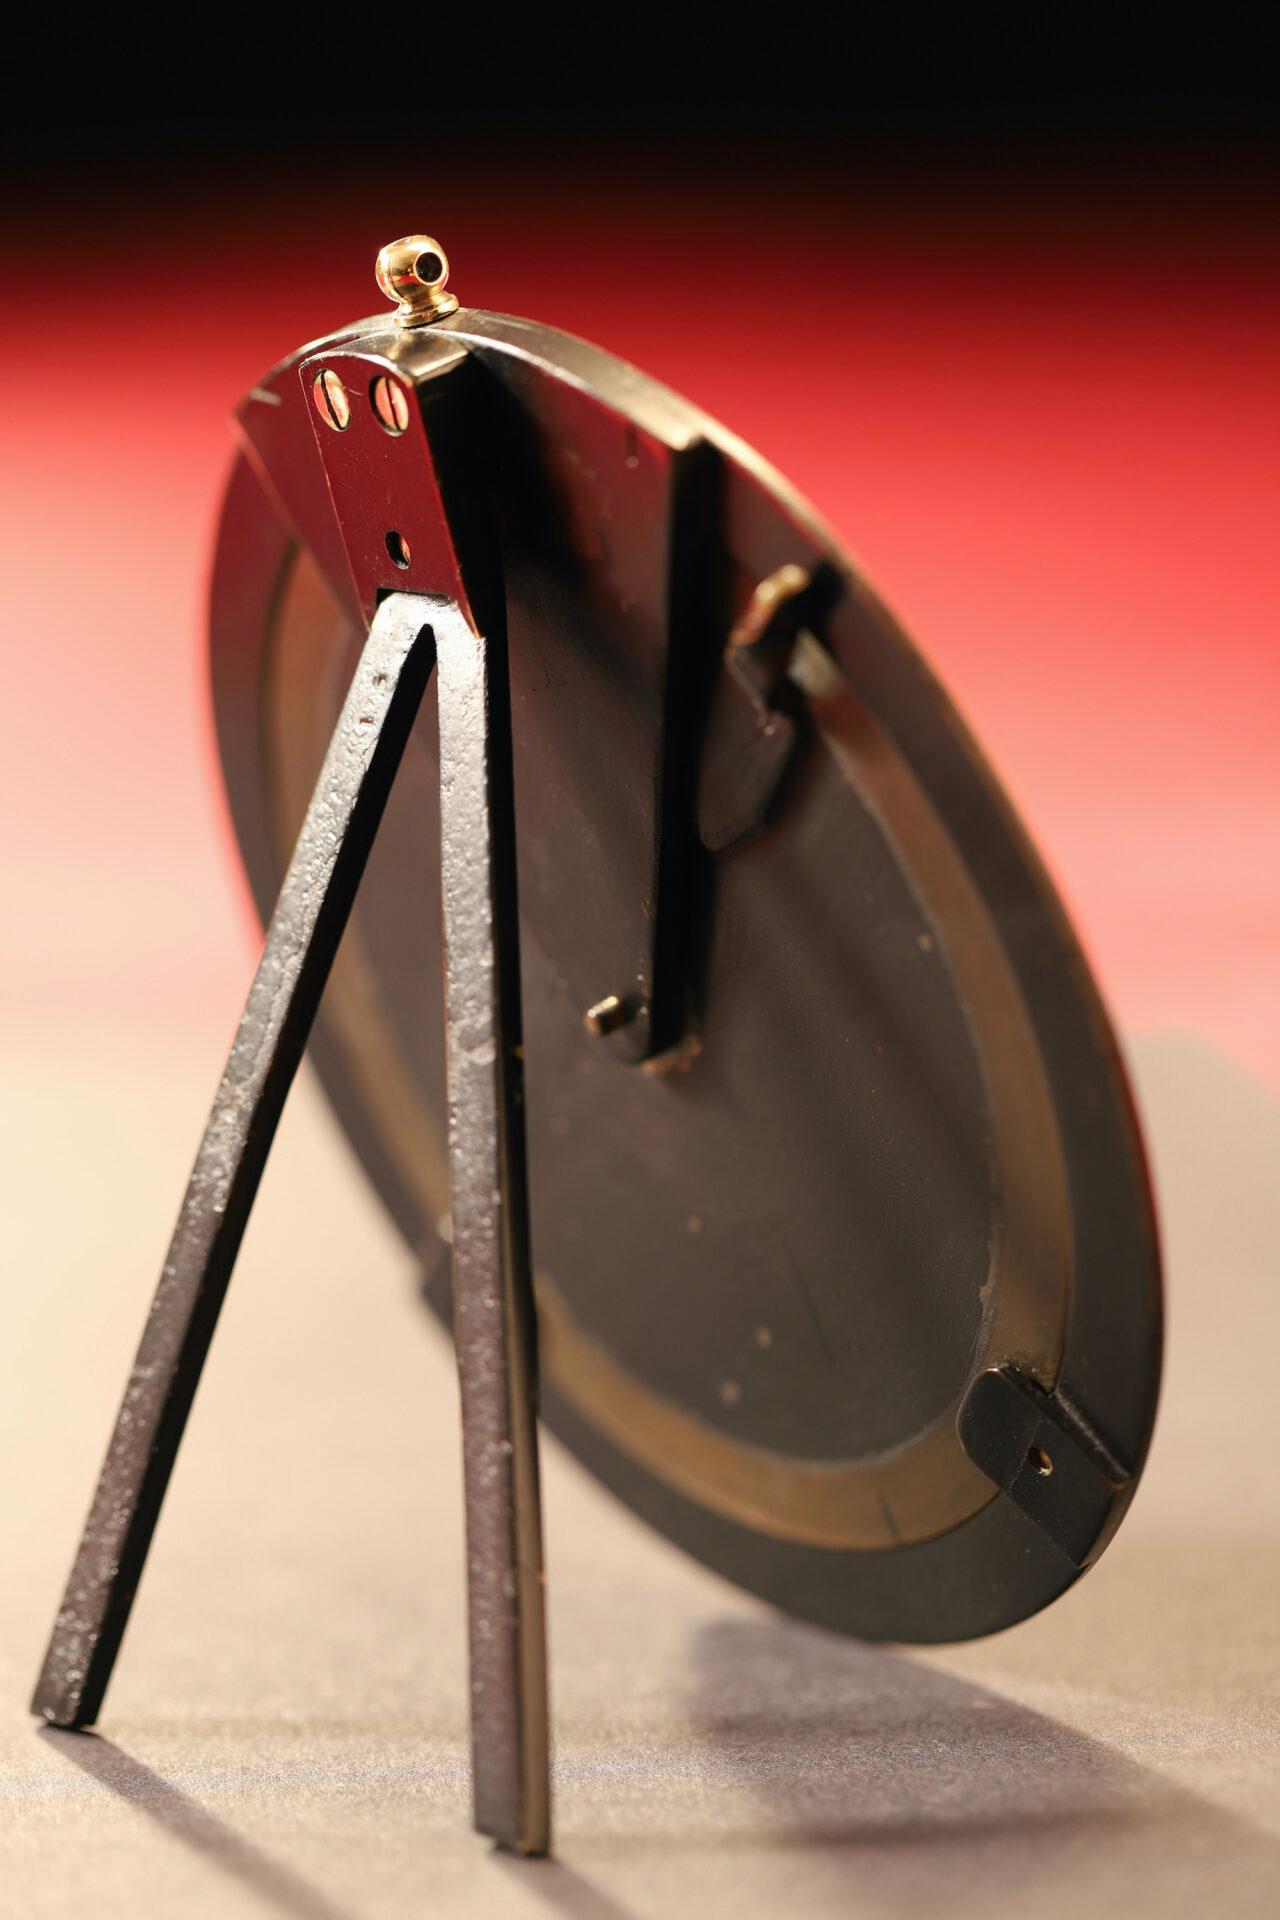 Image of reverse of Negretti & Zambra Brass Desk Forecaster